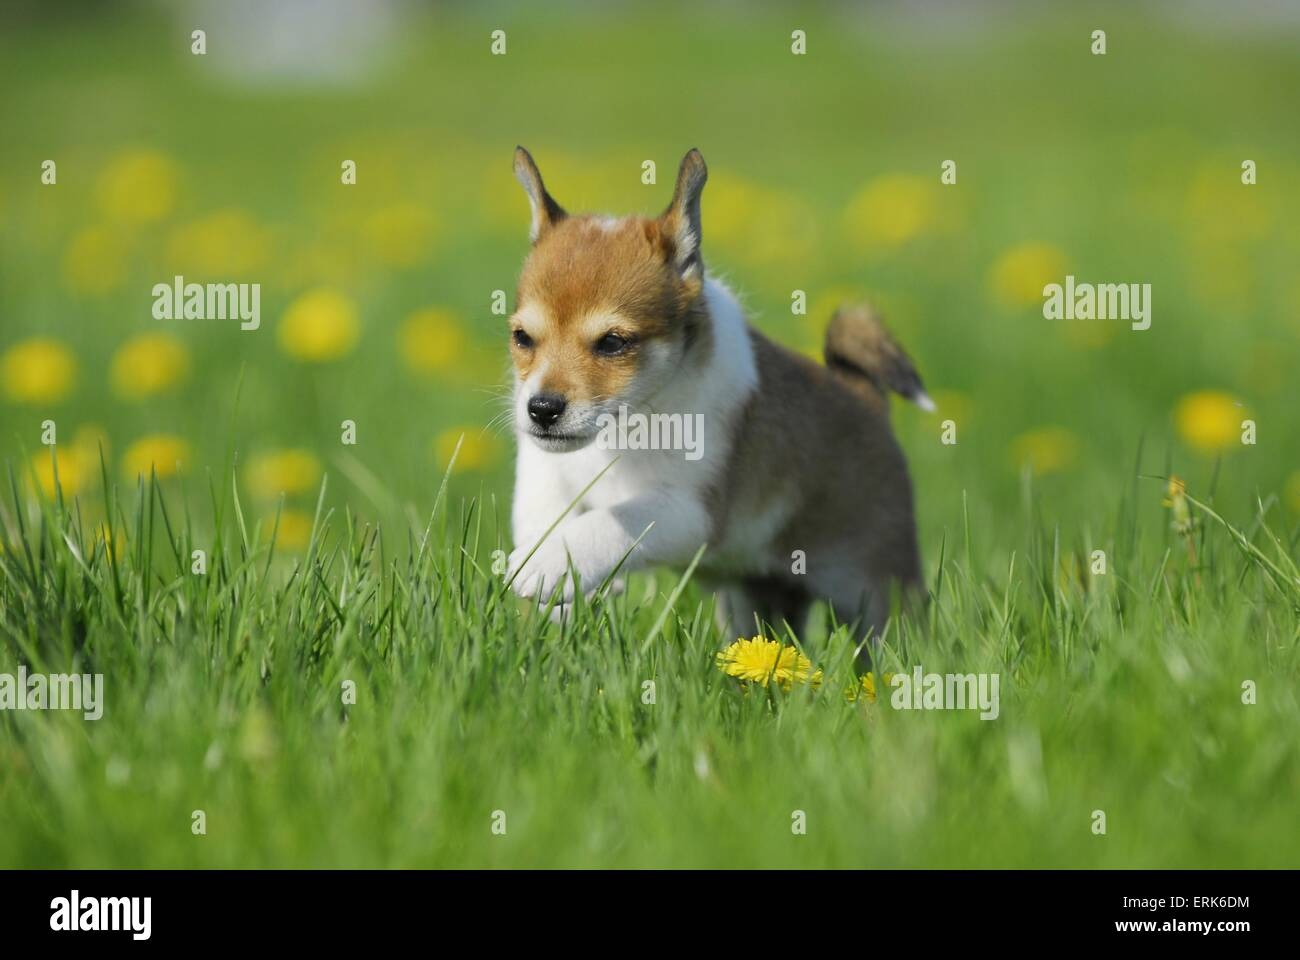 Norwegian Lundehund Puppy Stock Photo 83400736 Alamy